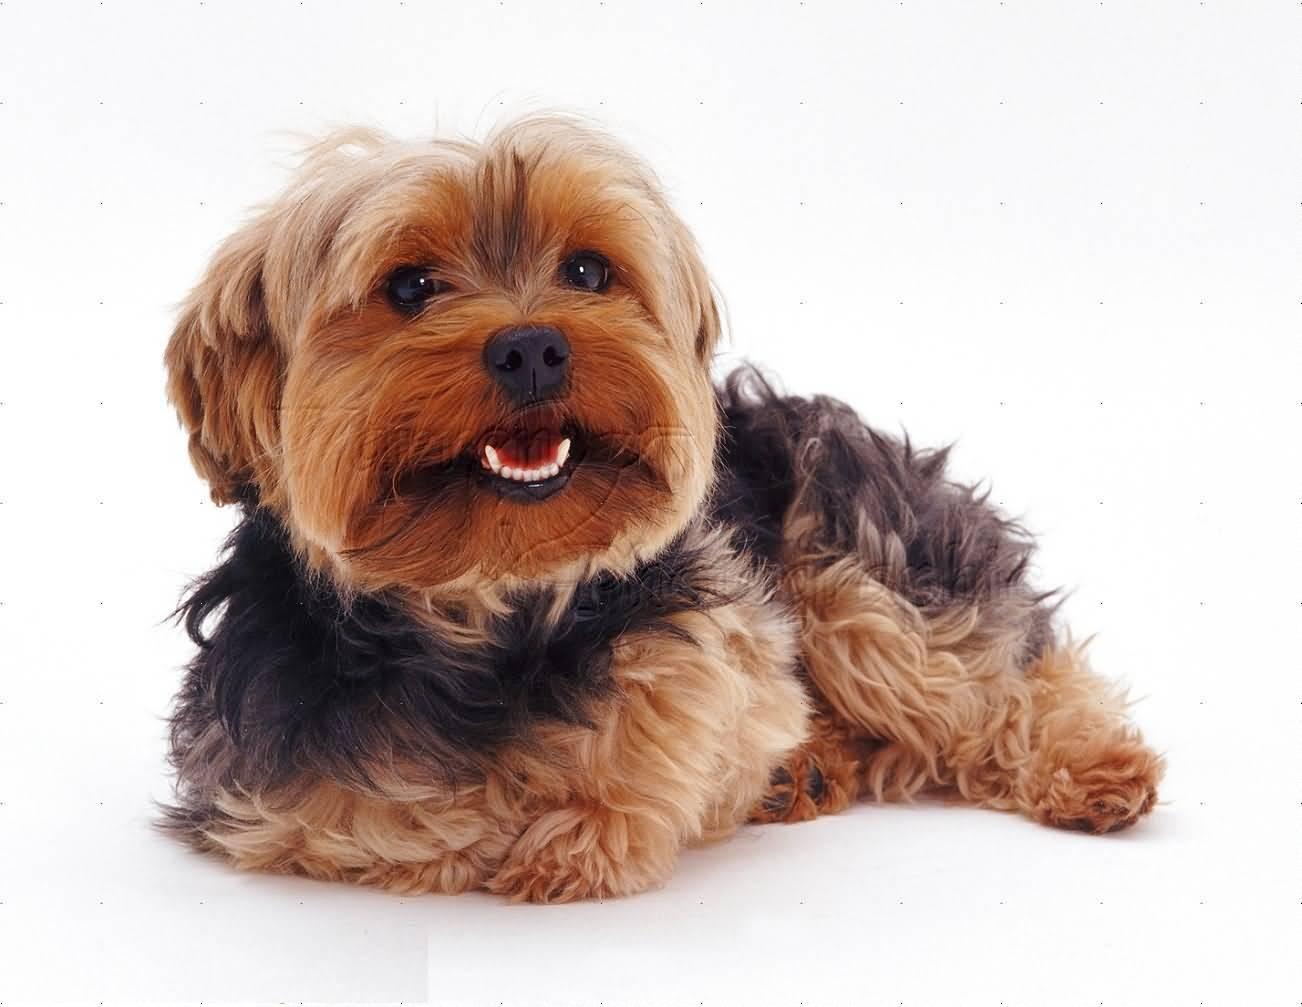 Very Nice Yorkshire Terrier Dog Pup Sitting On Floor